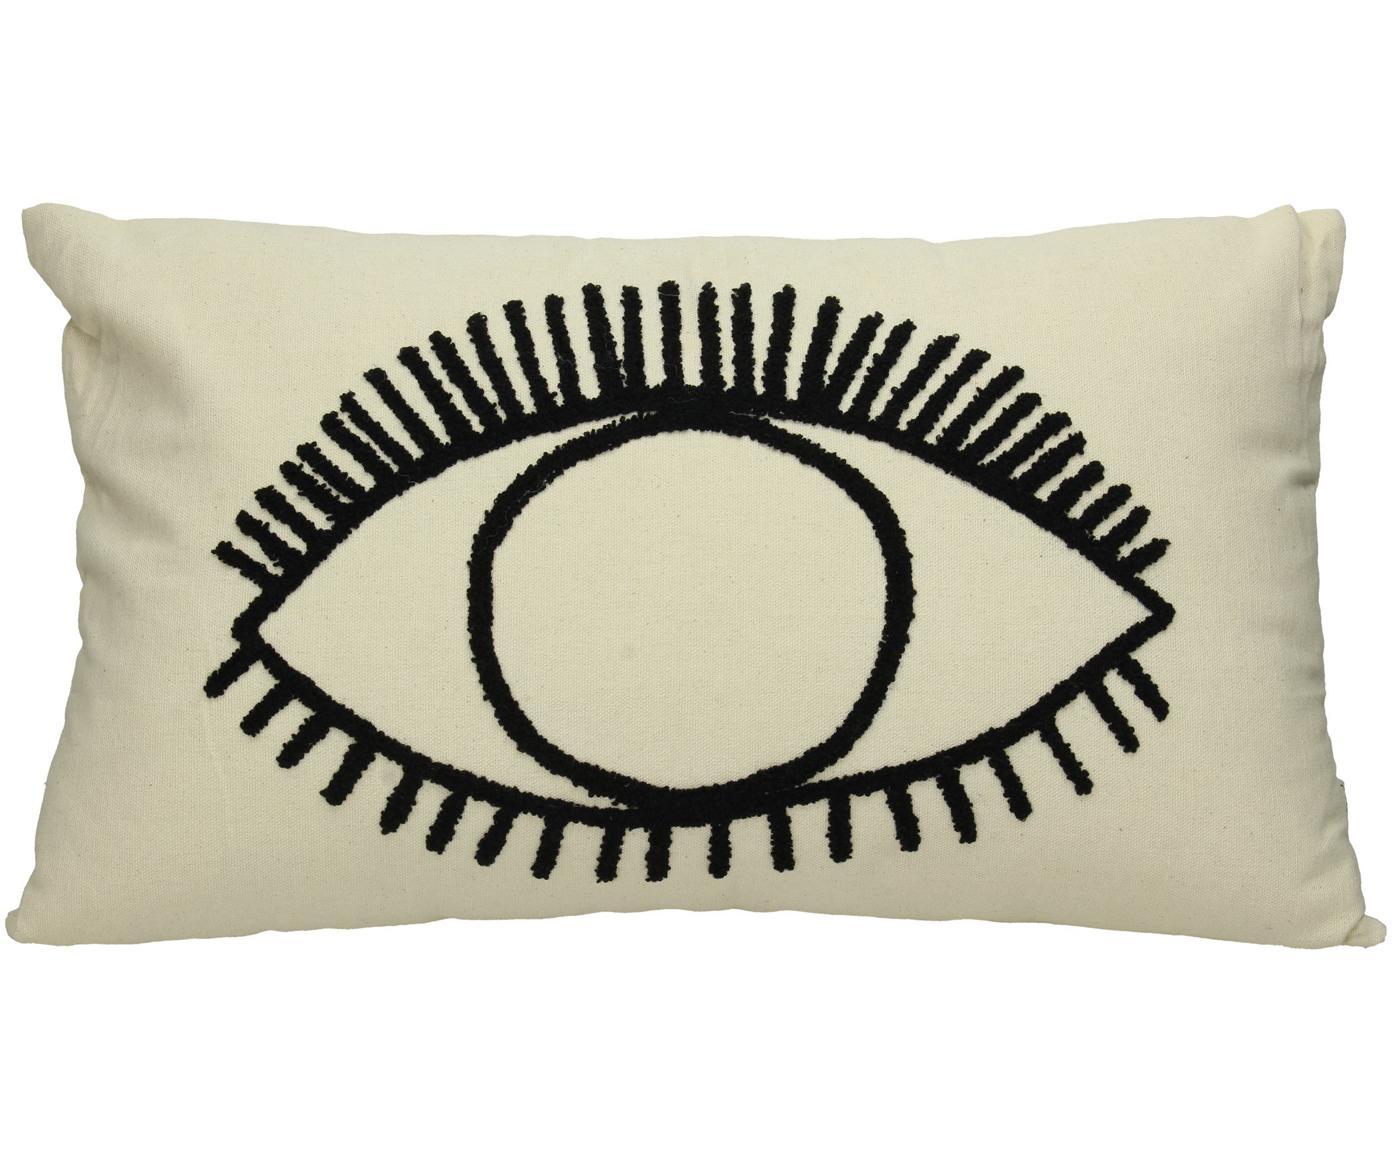 Cojín texturizado Eye, con relleno, 100%algodón, Marfil, negro, An 35 x L 50 cm